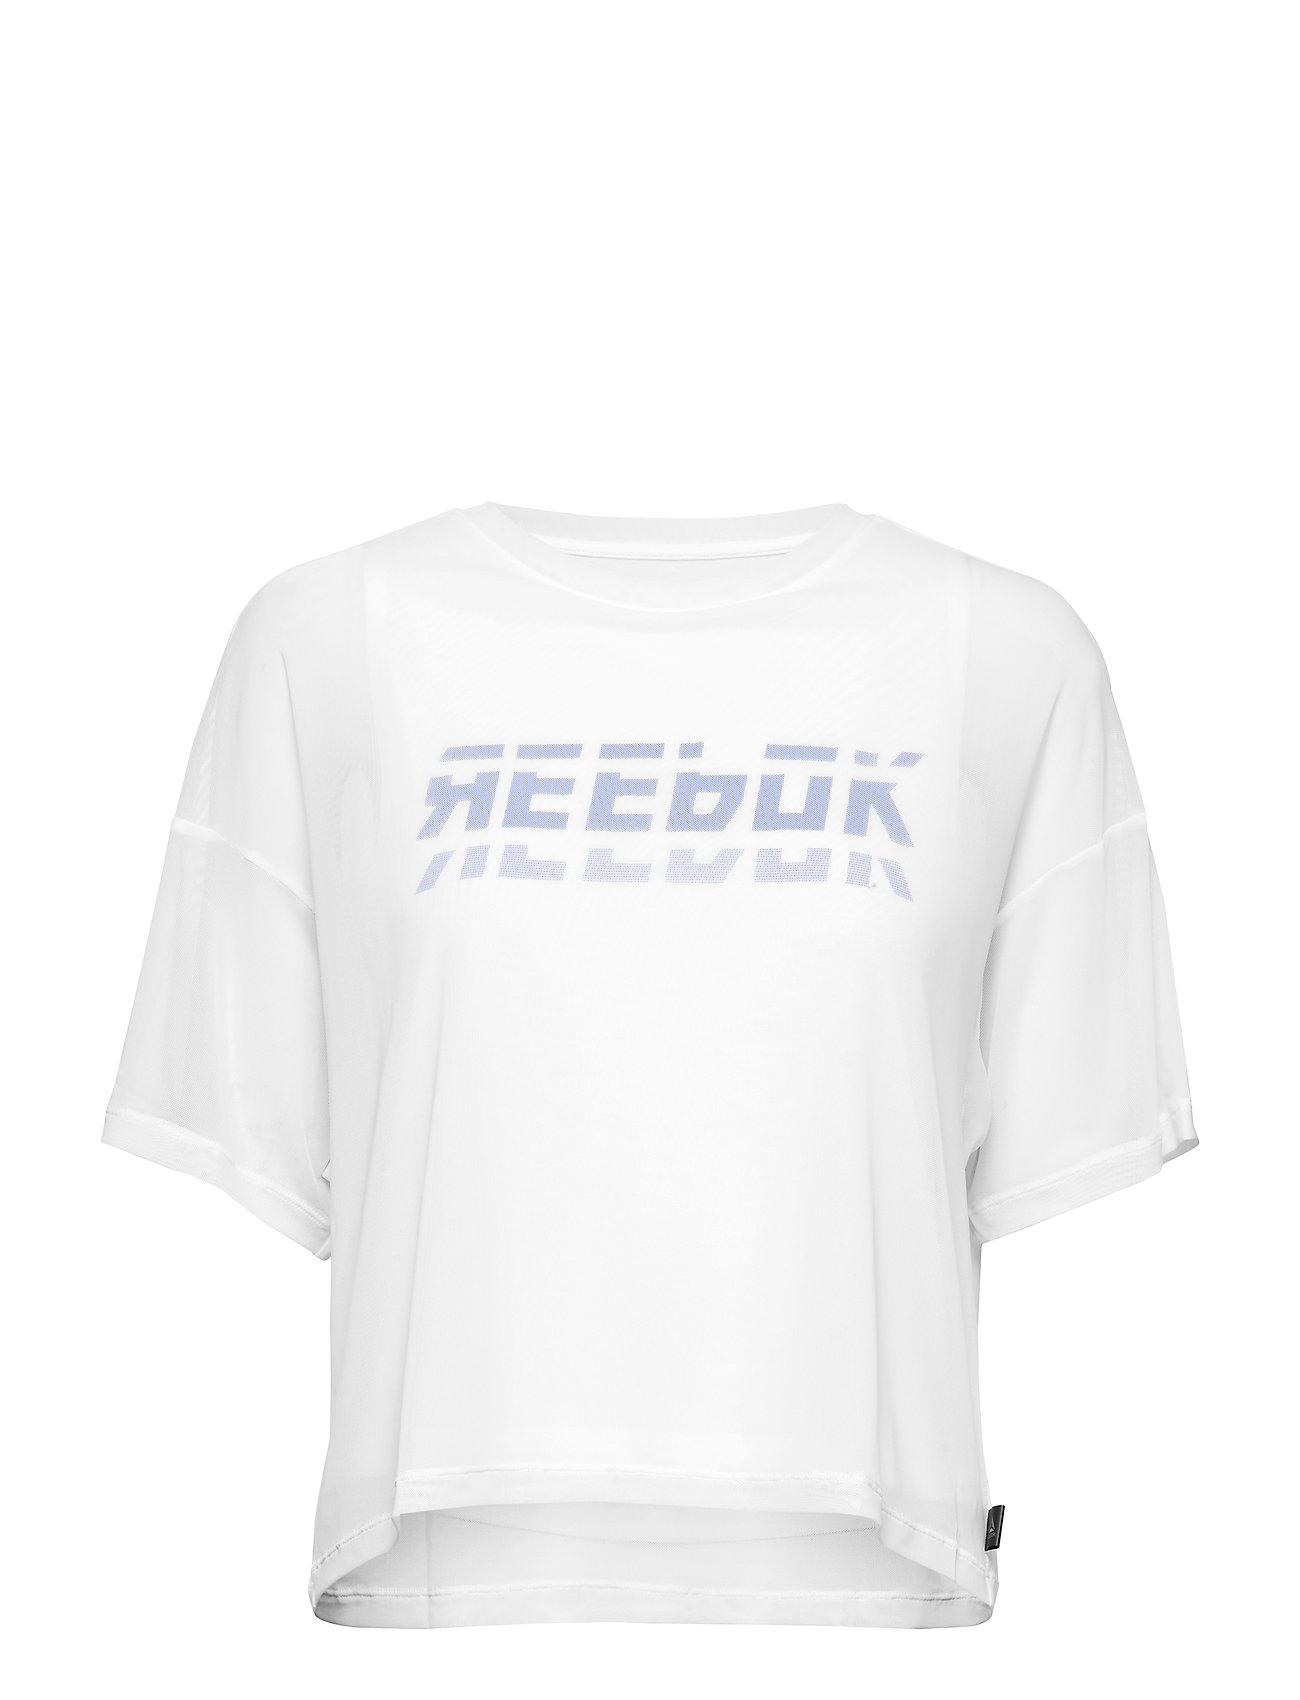 Reebok Performance WOR MYT MESH LAYER PIECE - WHITE